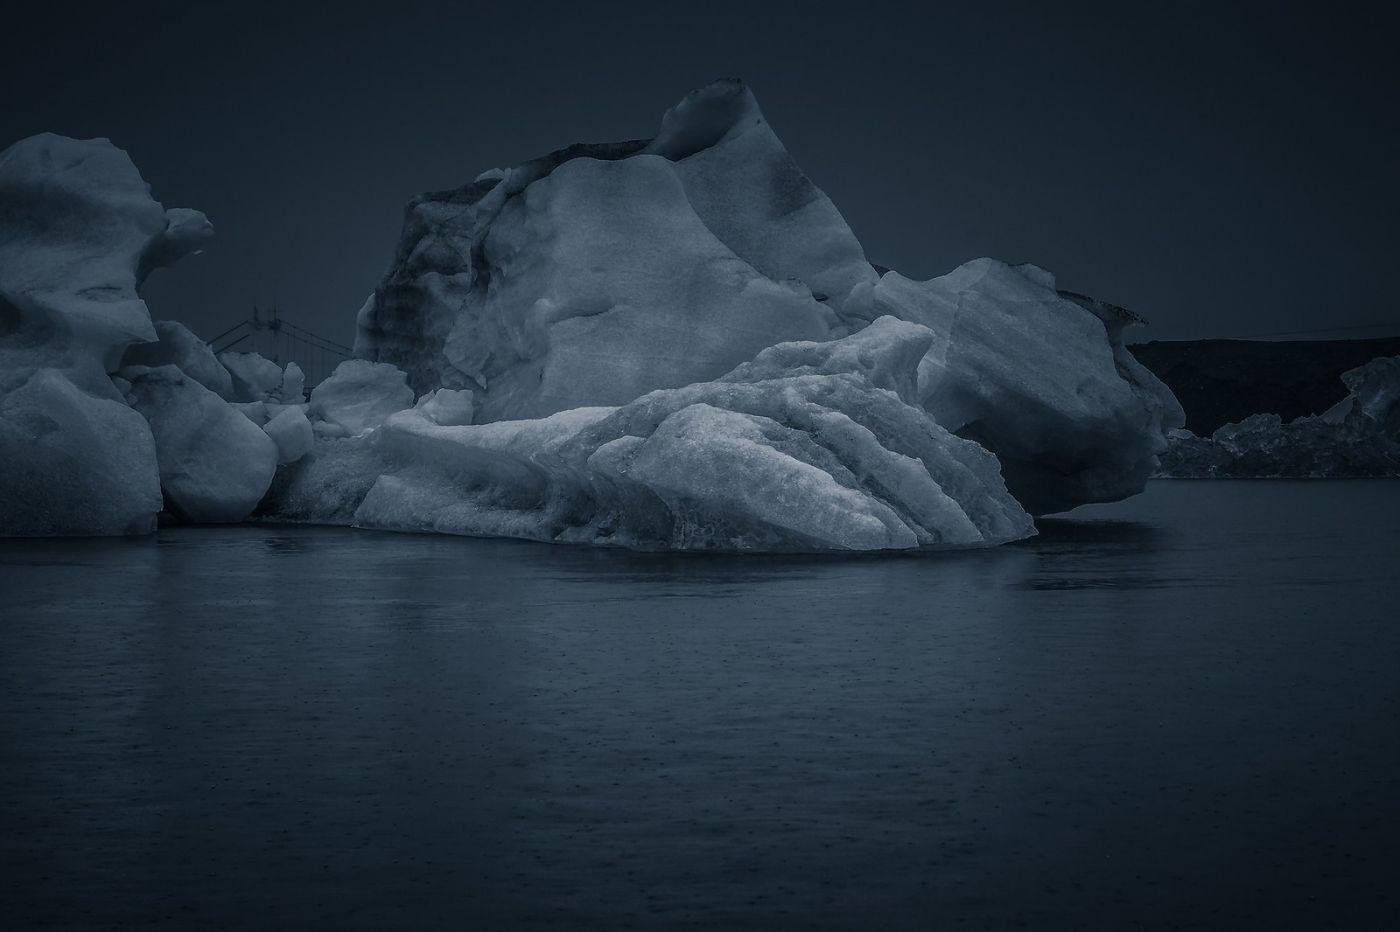 冰岛冰川泻湖(Glacier Lagoon),流动的冰川_图1-34